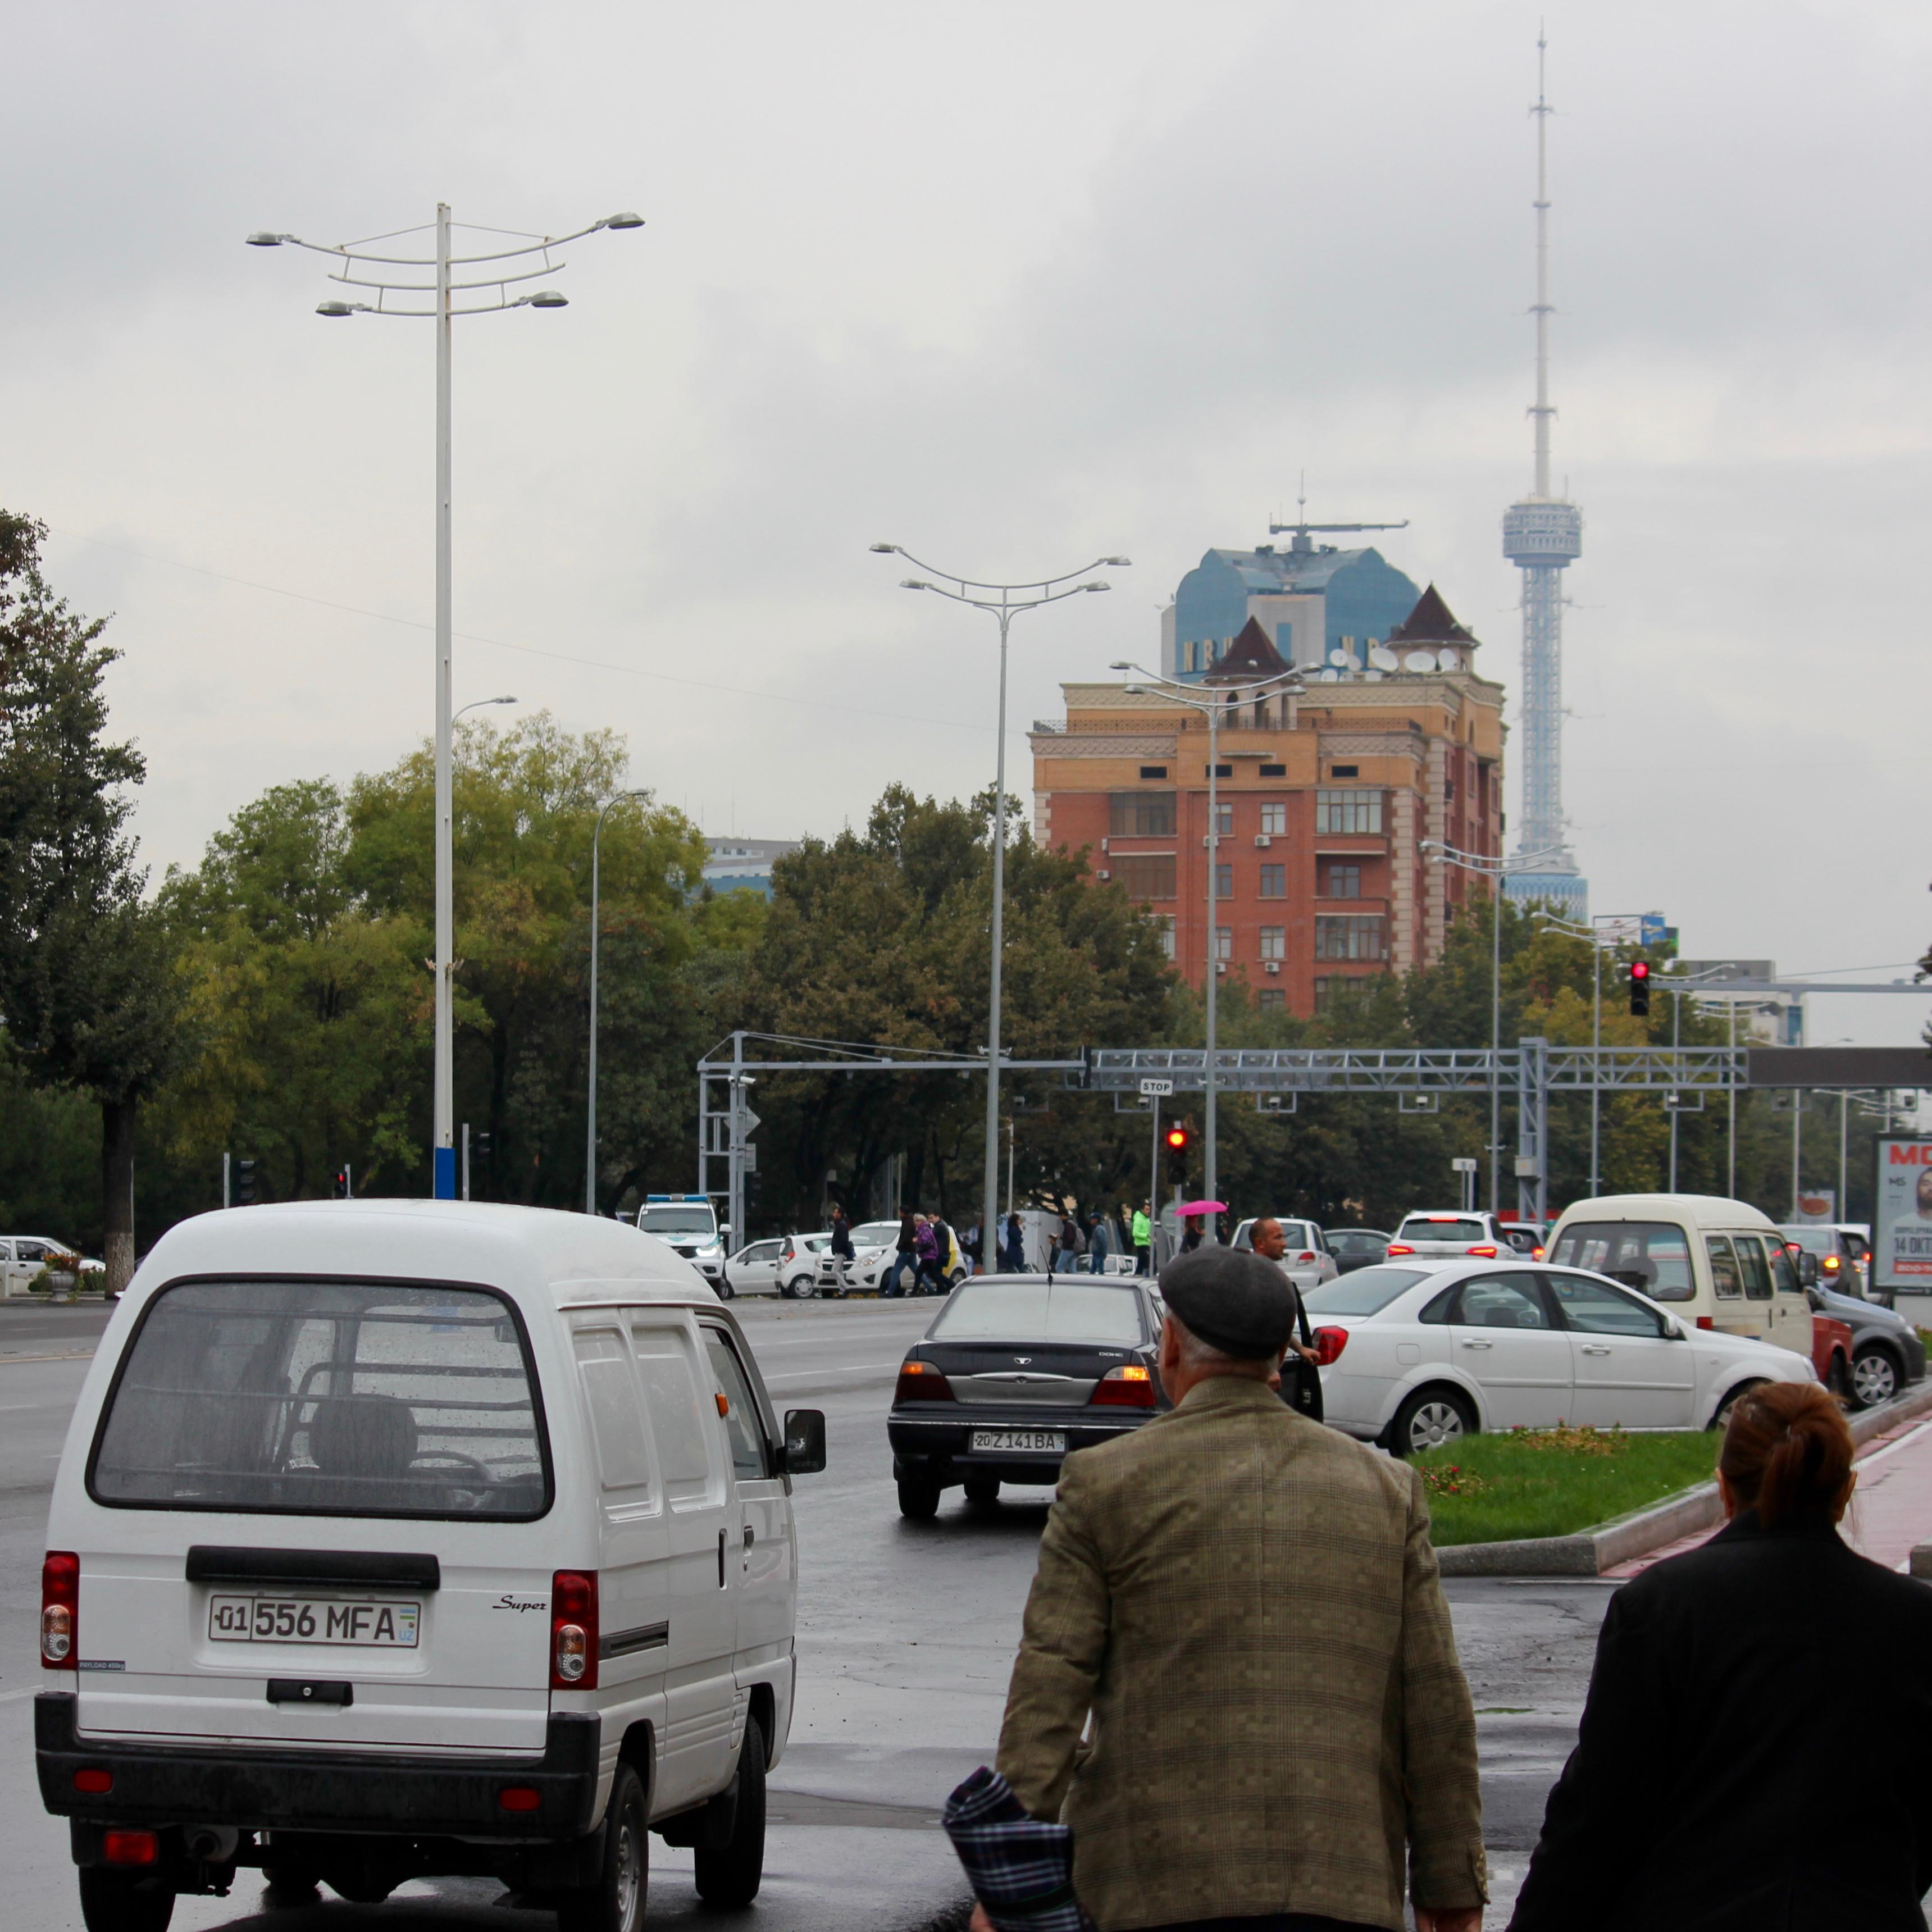 tashkent, uzbekistan - 18